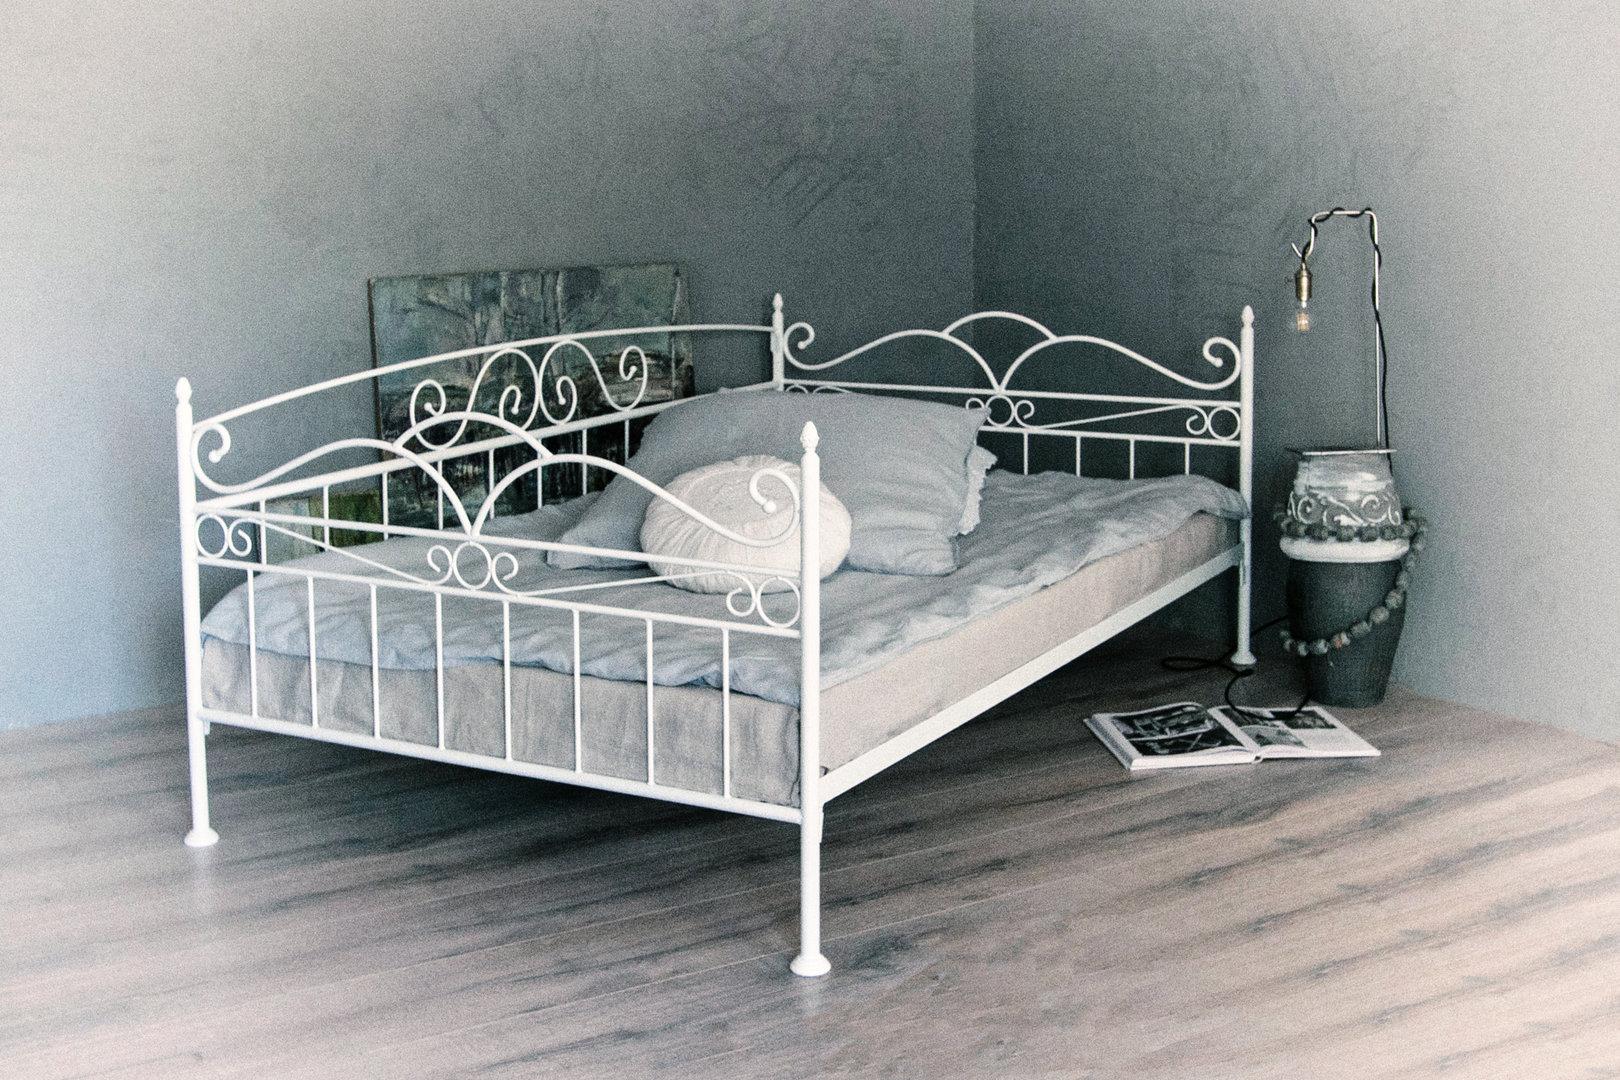 Full Size of Trend Sofa Bett 90x200 In Weiss Ecru Transparent Kupfer Massivholz 180x200 Mit Stauraum 160x200 Schlafzimmer Set Boxspringbett 100x200 Weiß Schubladen Bett Bett 90x200